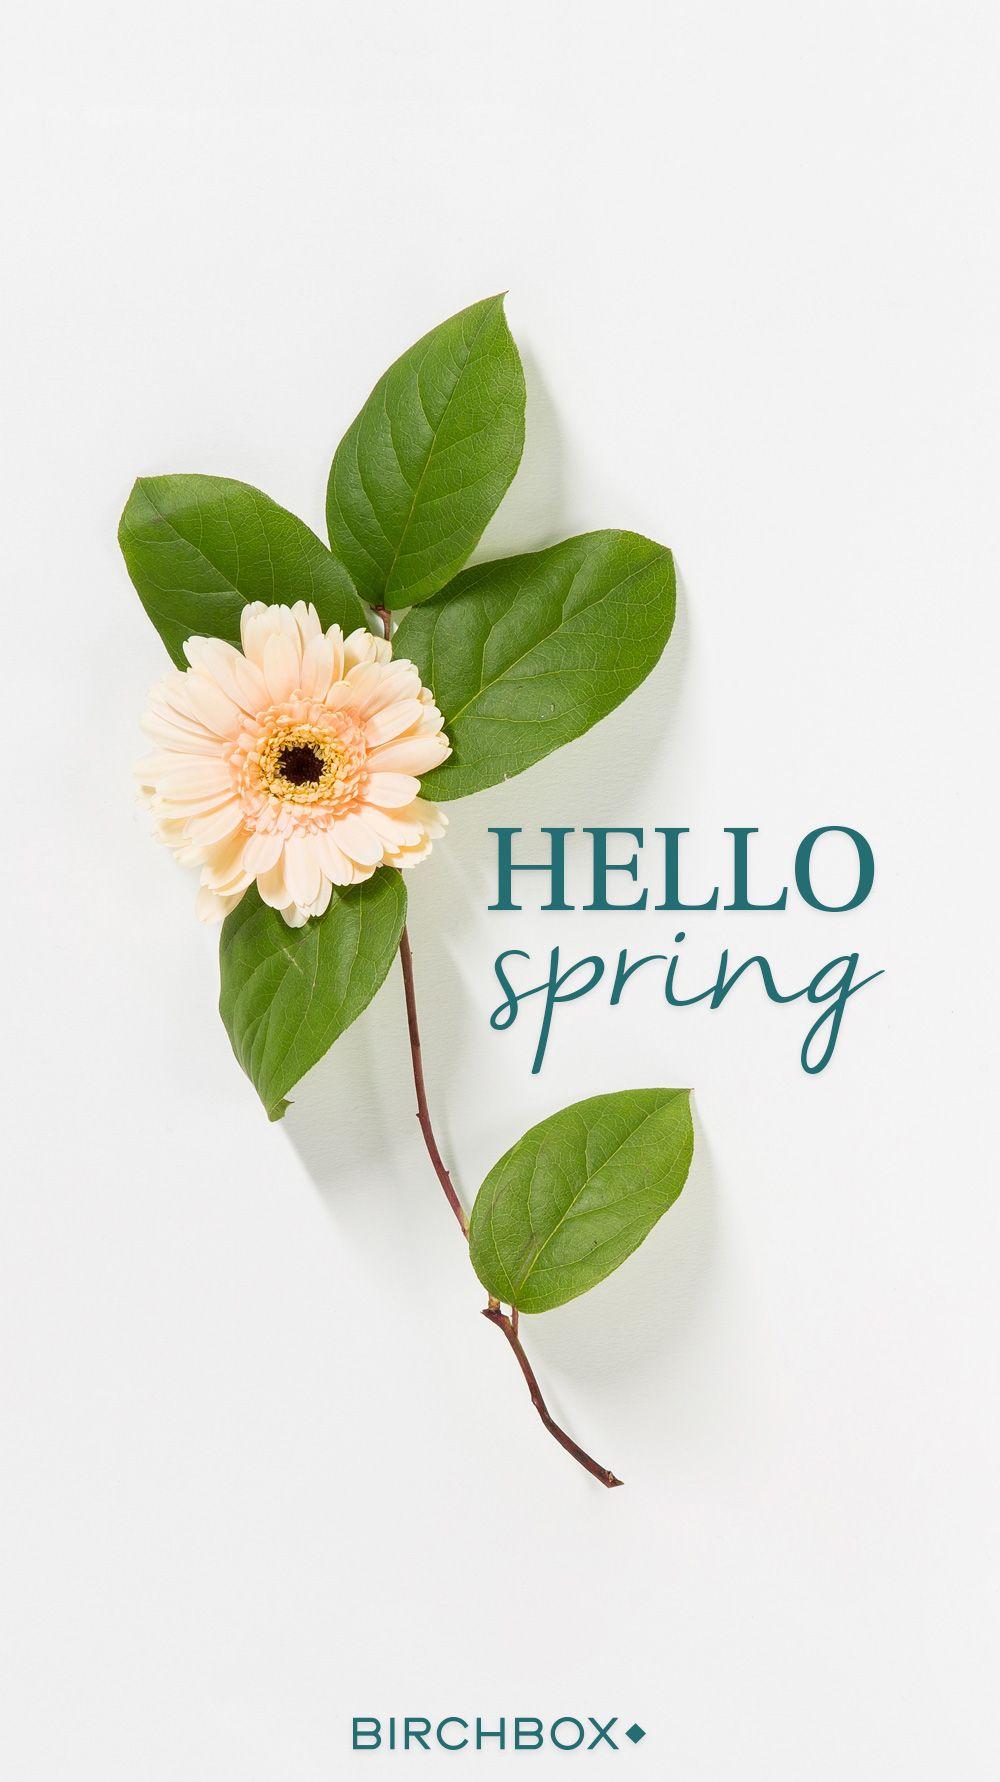 Hello Spring Vos Fonds D Ecran Du Printemps Encyclobeaute Birchbox